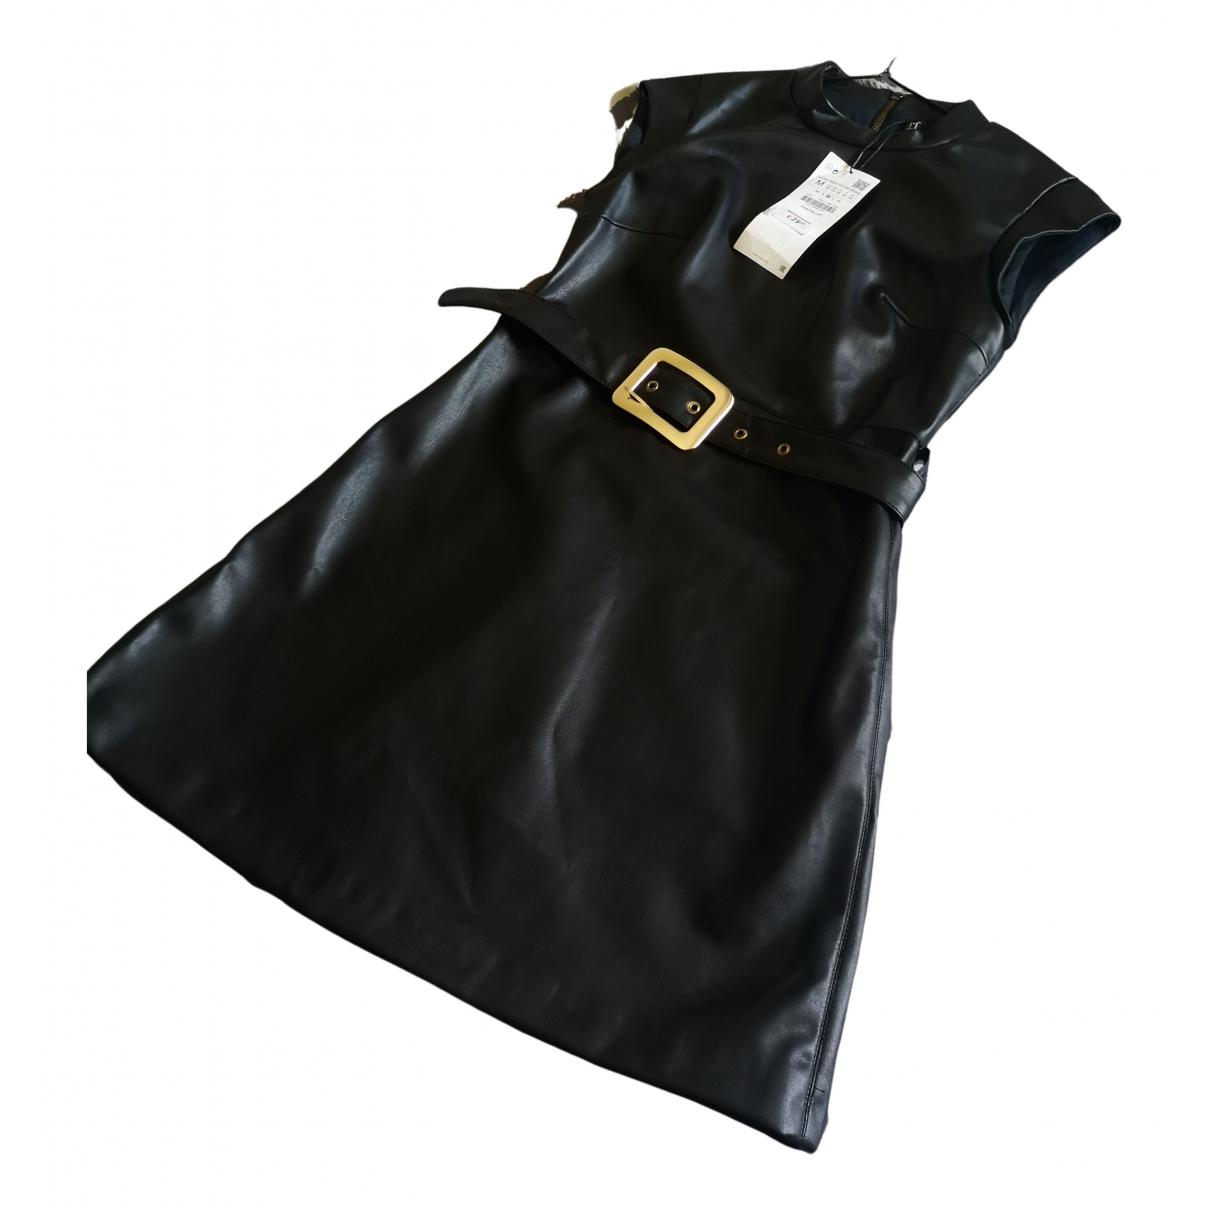 Zara - Robe   pour femme en cuir verni - noir